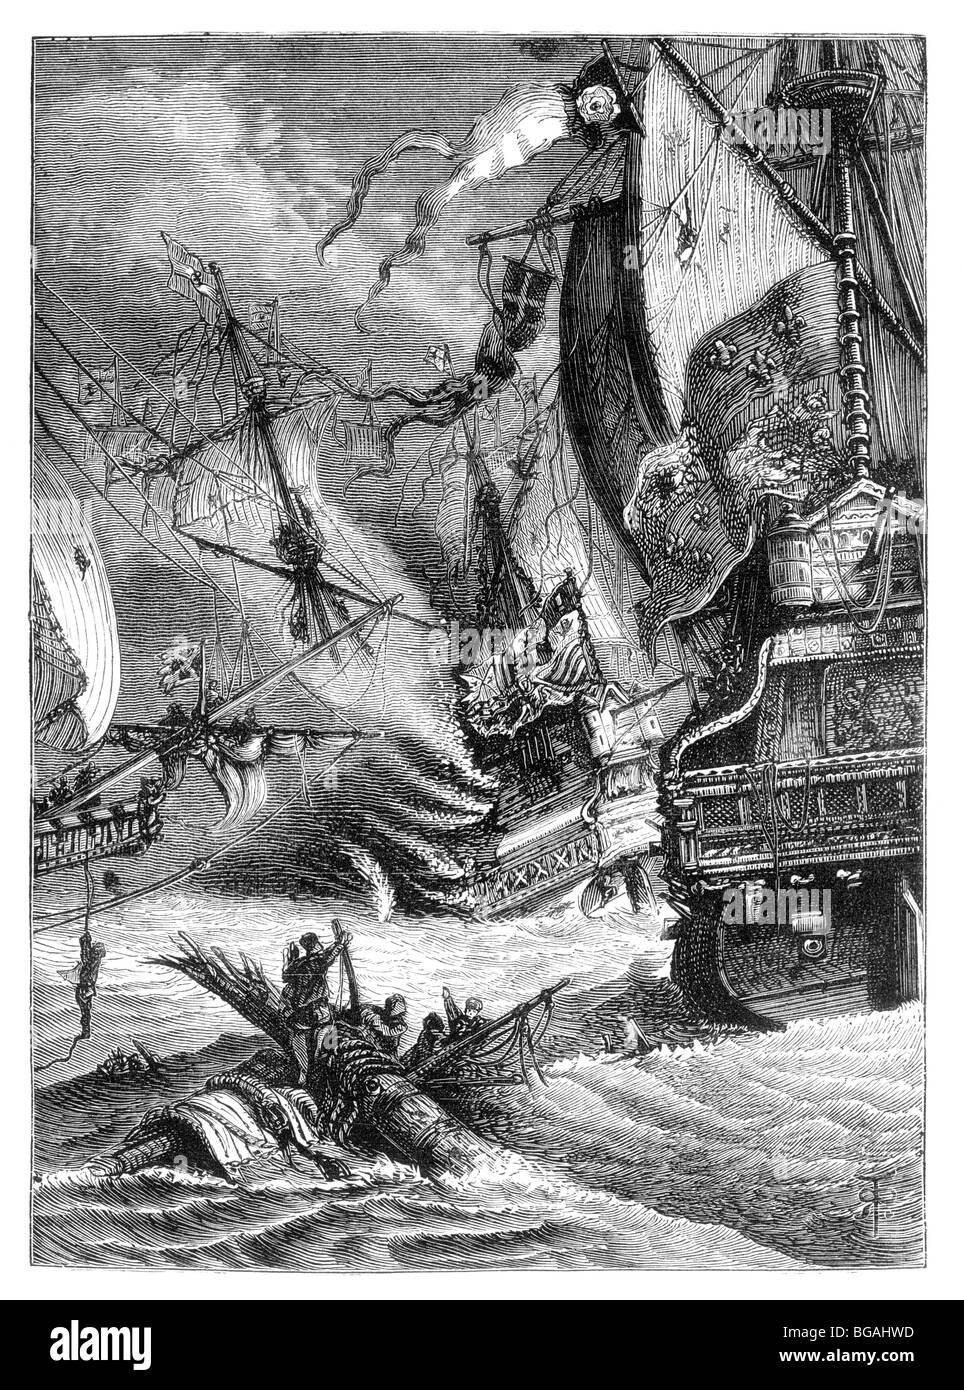 Illustration; The destruction of the Spanish Armada by the English Fleet, 1588 - Stock Image